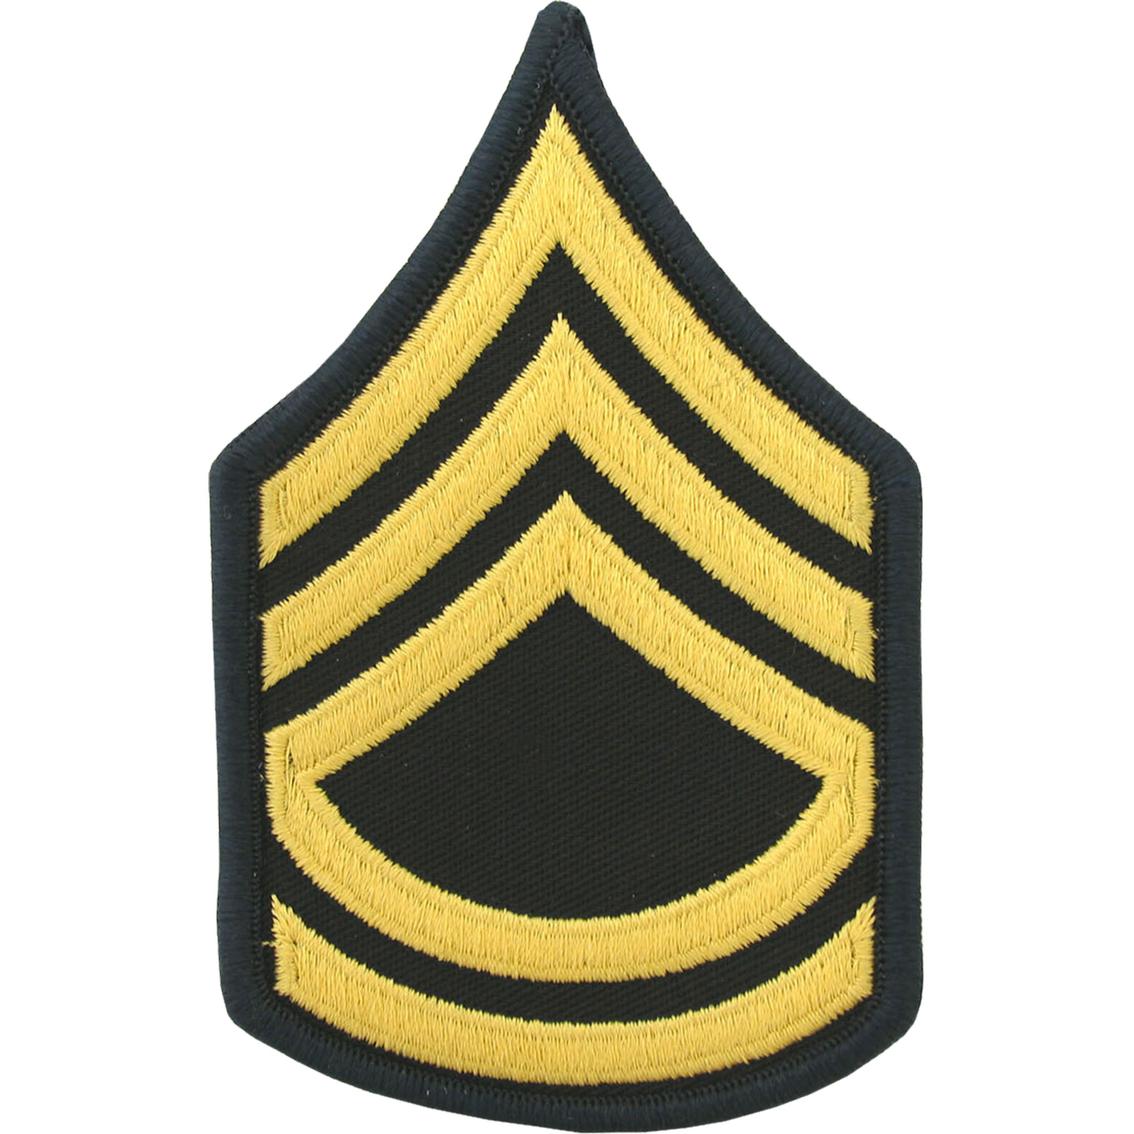 Army Sfc Small Asu Sew On Rank Small Asu Rank Military